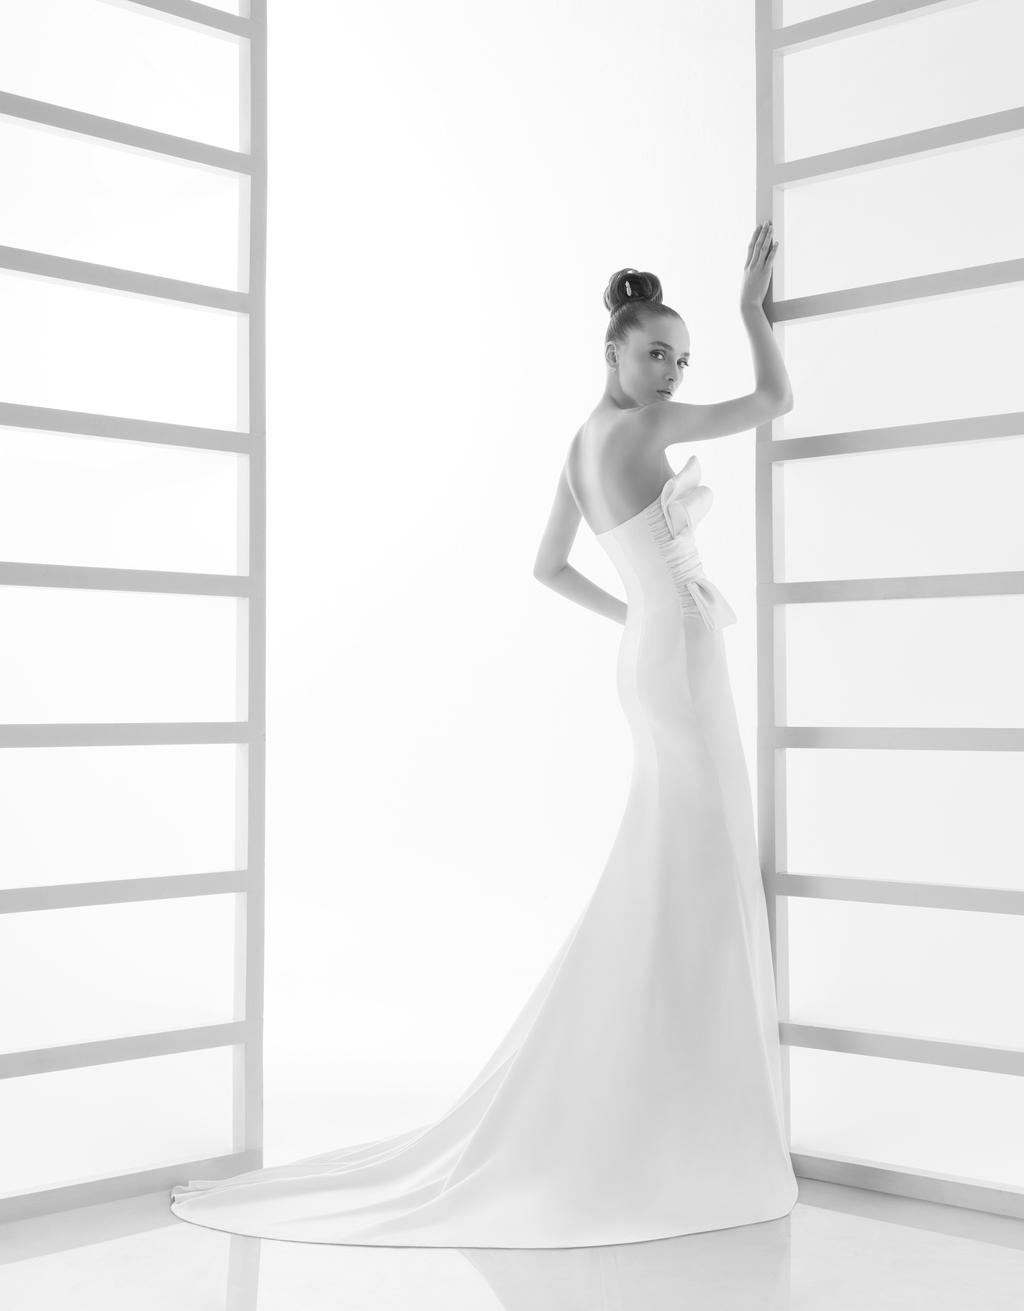 119-elana-rosa-clara-wedding-dress-sleek-white-strapless-side.full